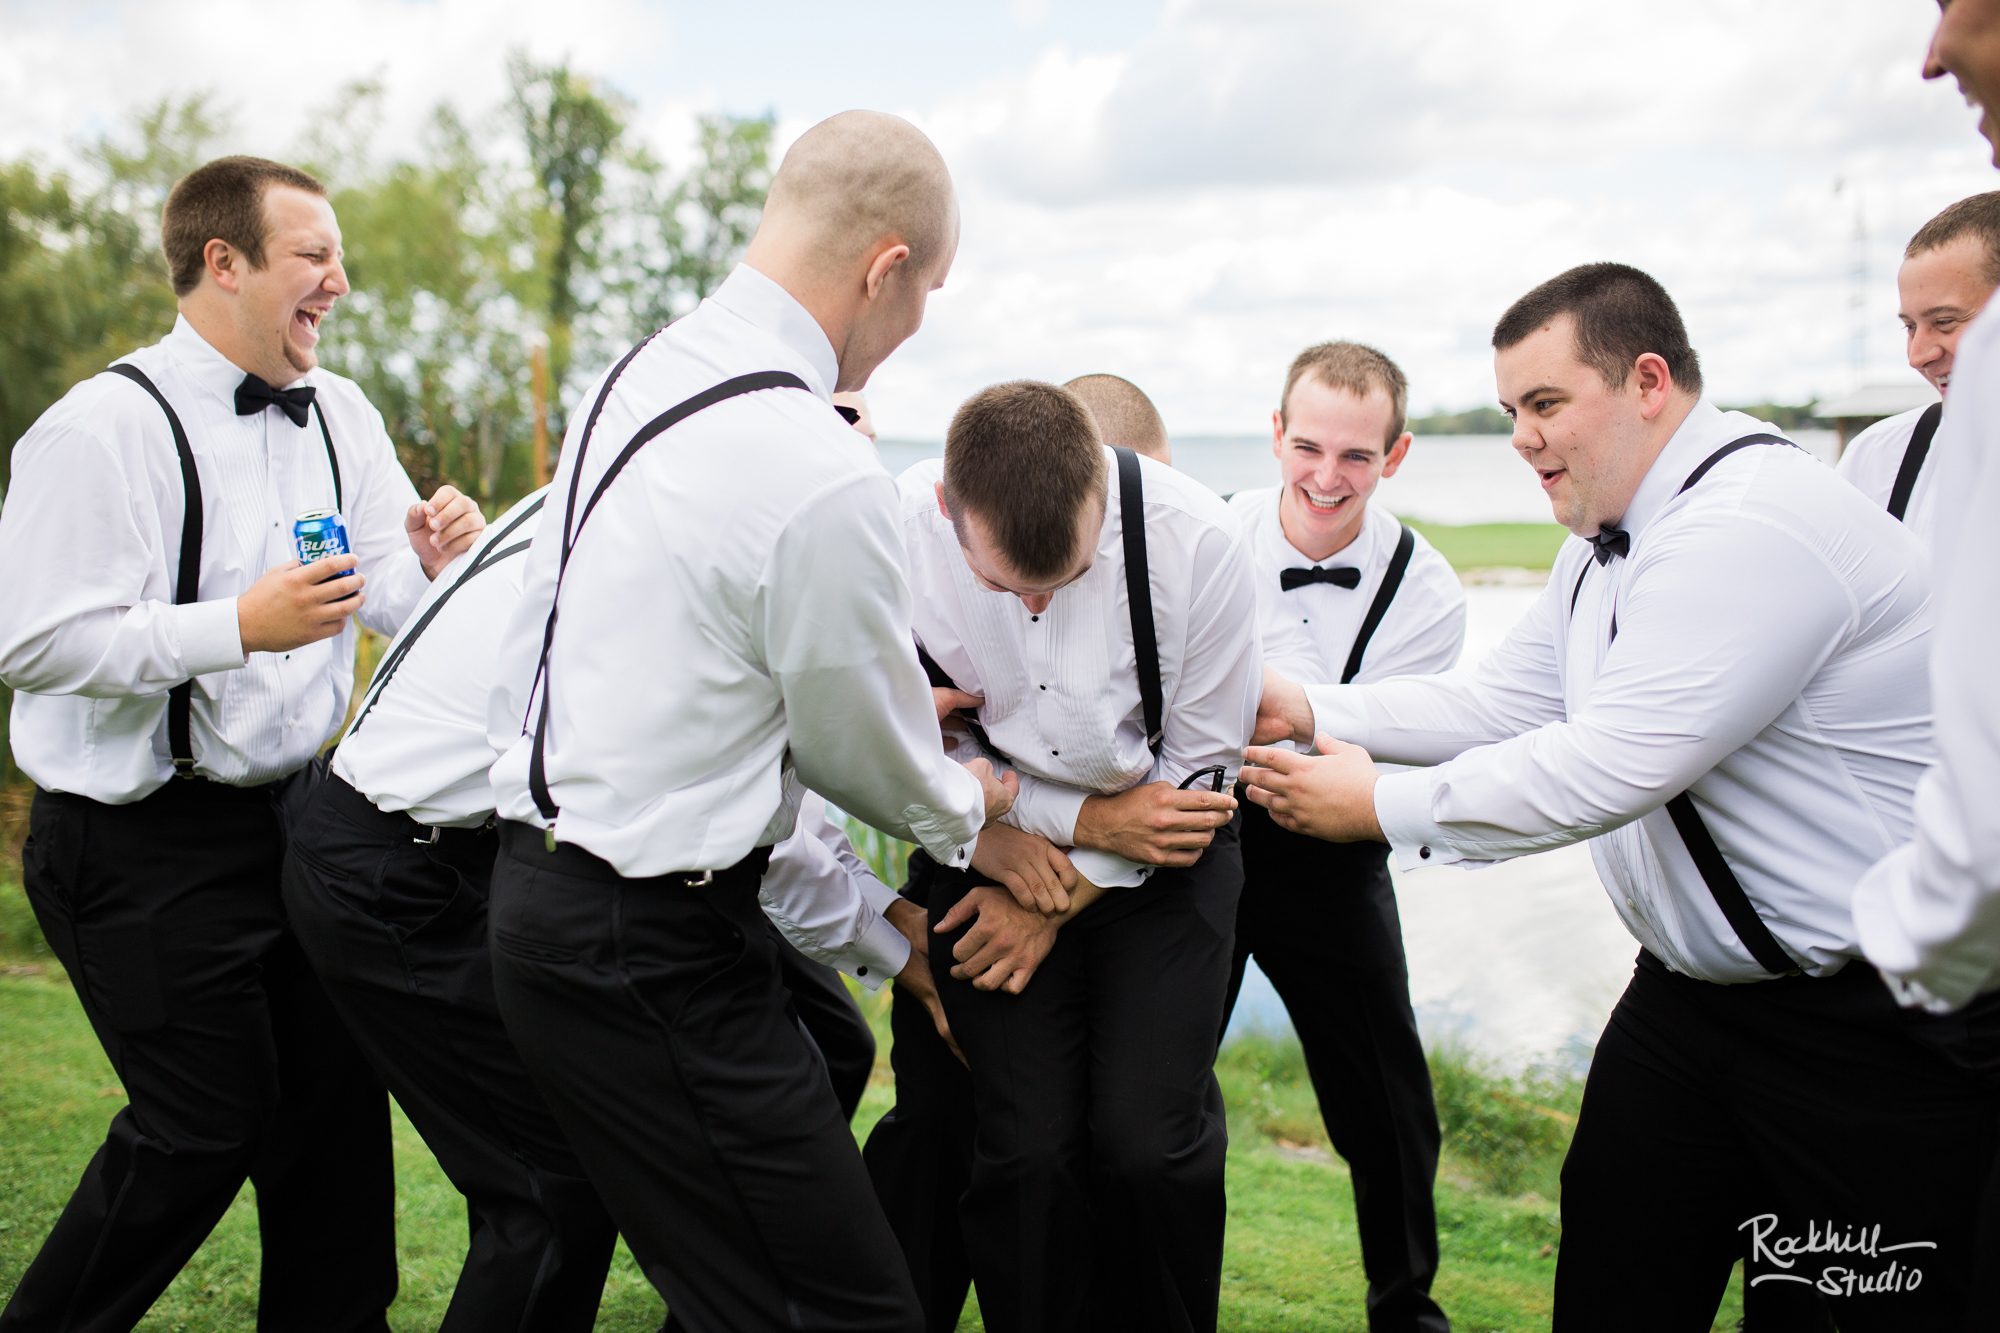 rockhill studio curtis michigan wedding